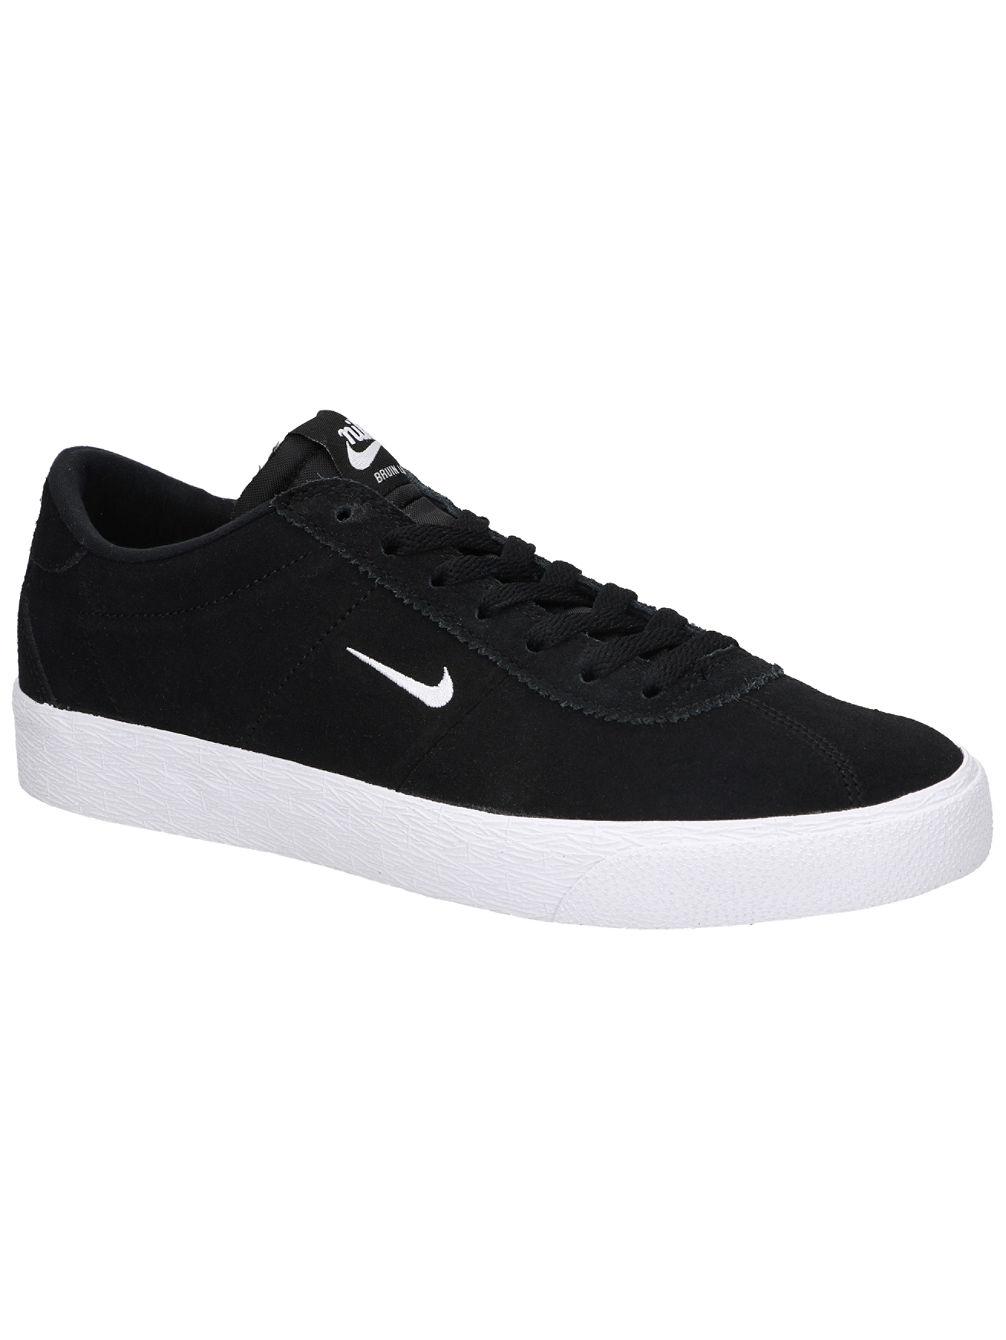 4905f67f759 Köp Nike SB Zoom Bruin Ultra Skateskor online på Blue Tomato